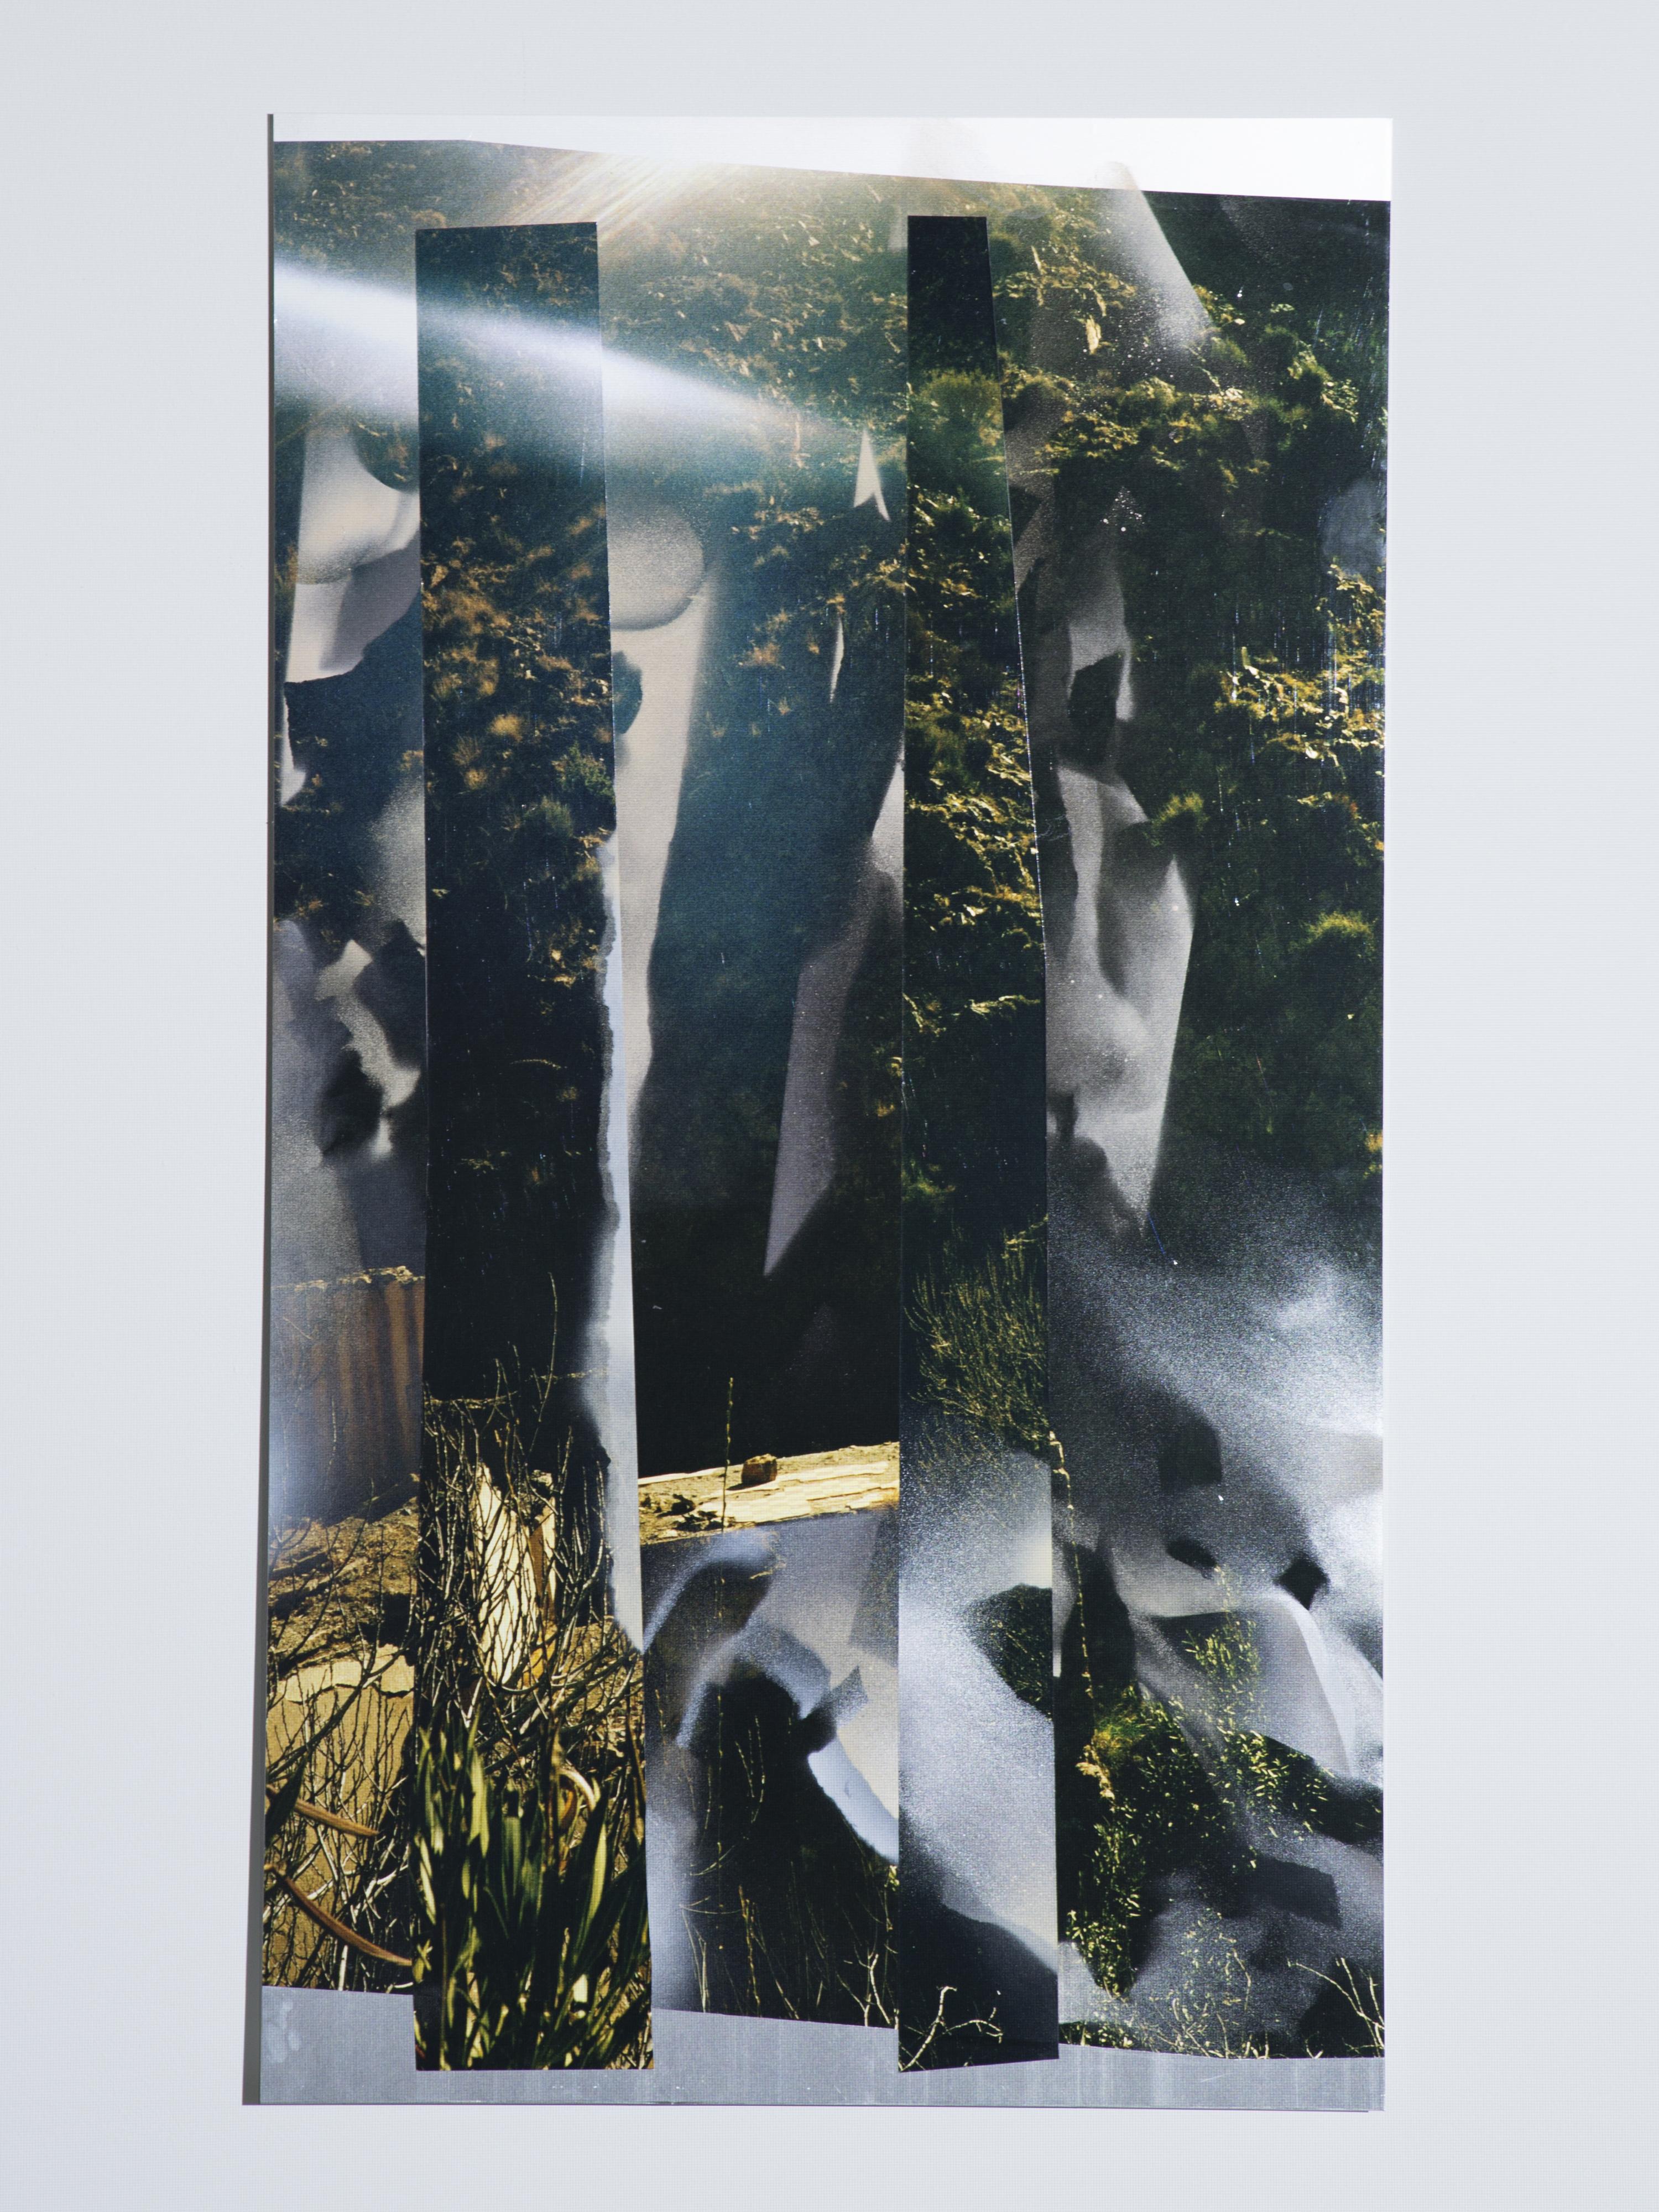 Josephine-Callaghan_Une-Tache-de-Naissance-I, C-type print,sheet aluminium, spray paint, white light, 790 x 1340